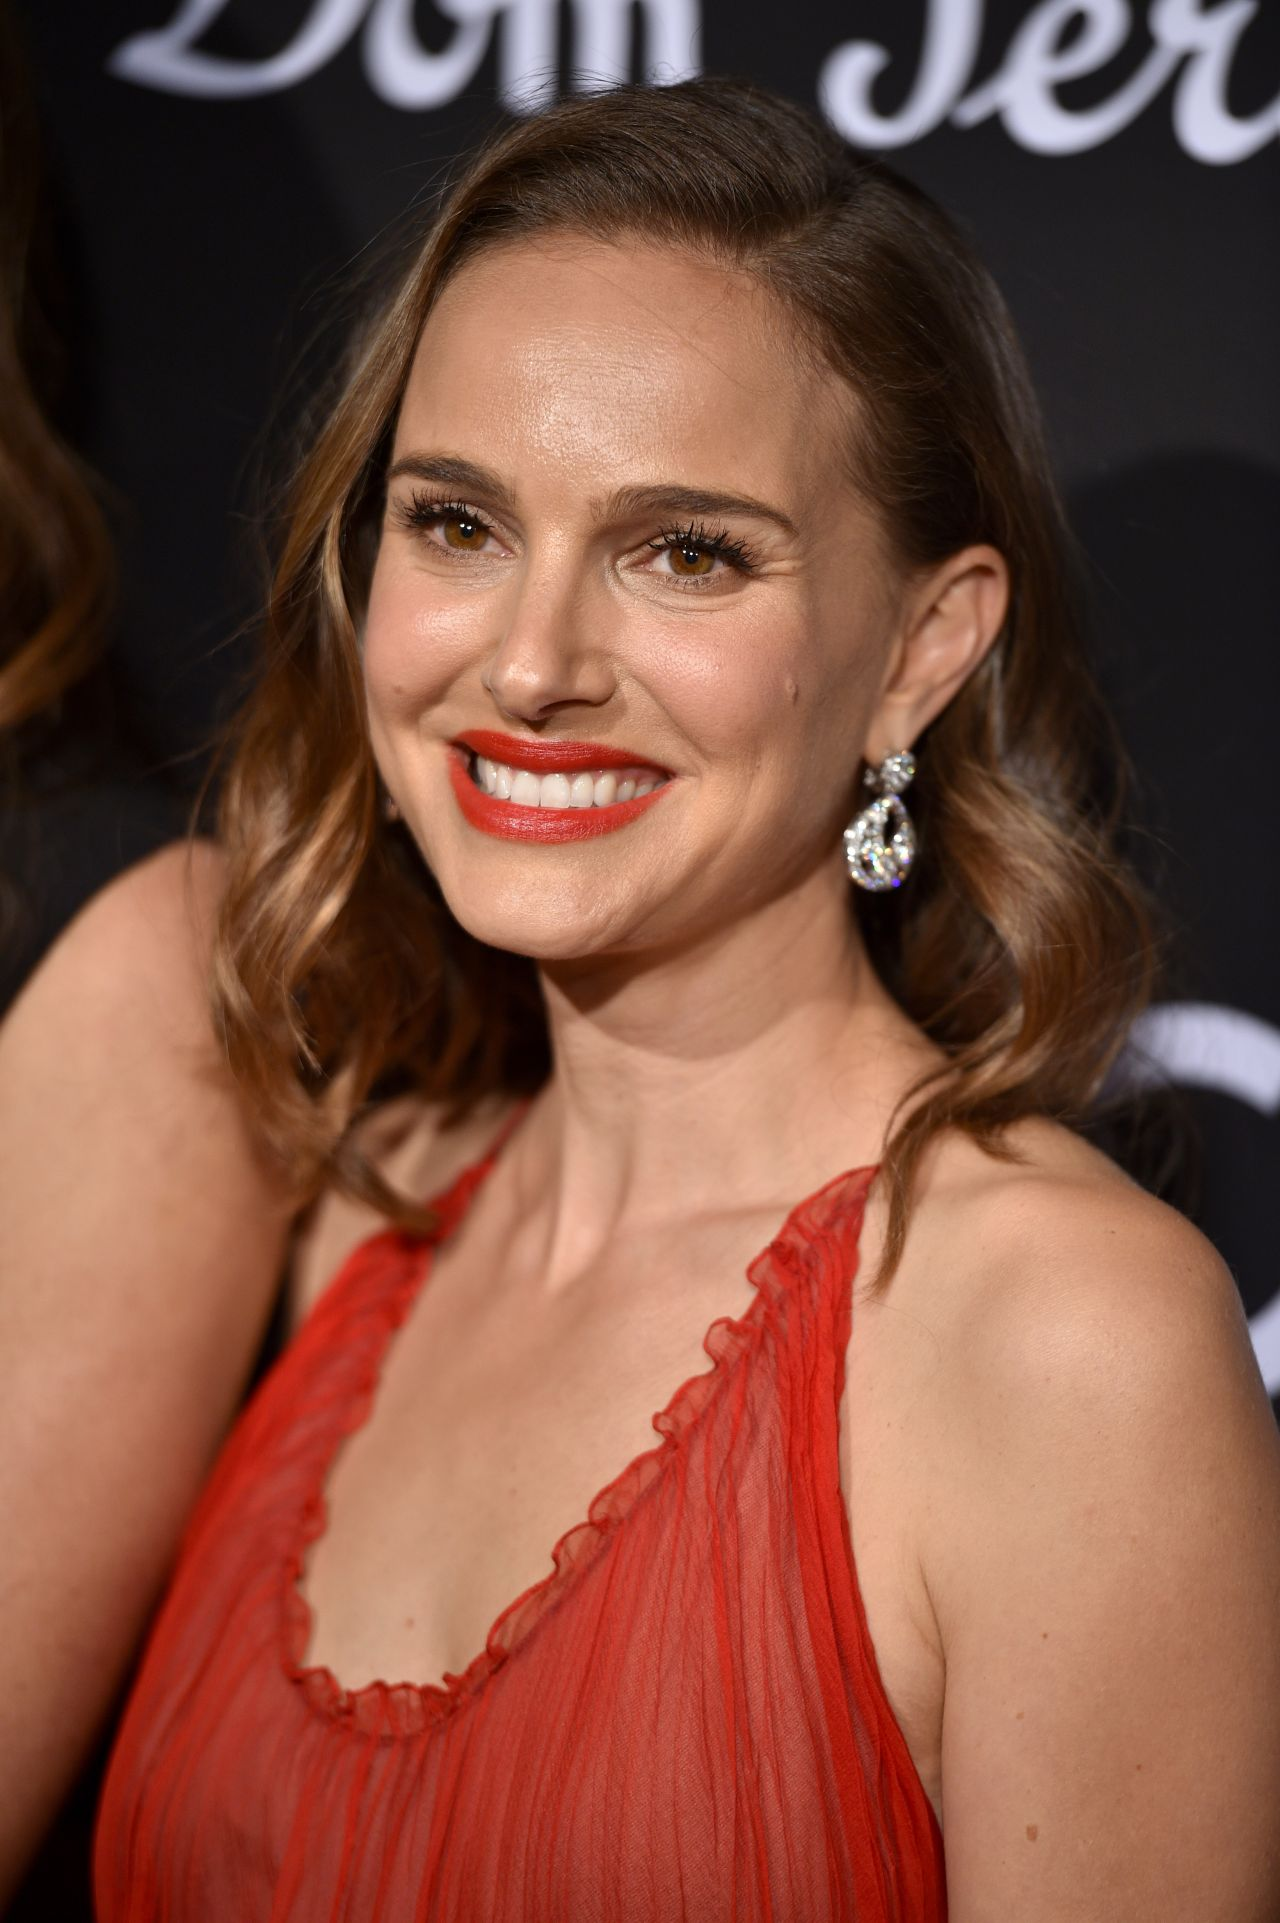 Natalie Portman Ladp Dance Project Gala 2018